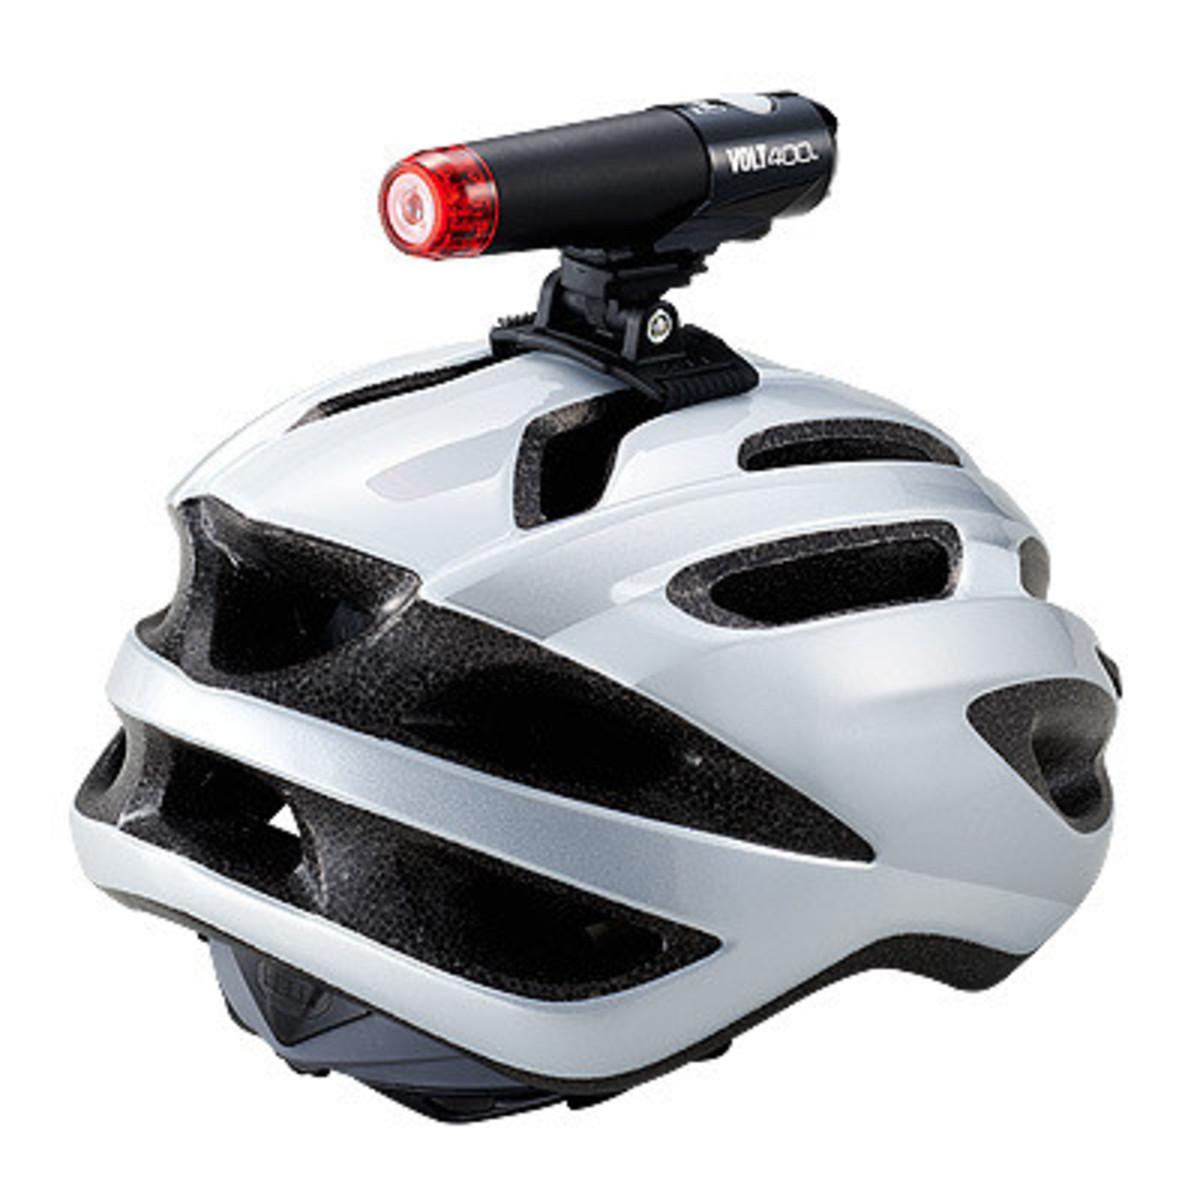 CatEye Volt 300 Headlight with Helmet Mount